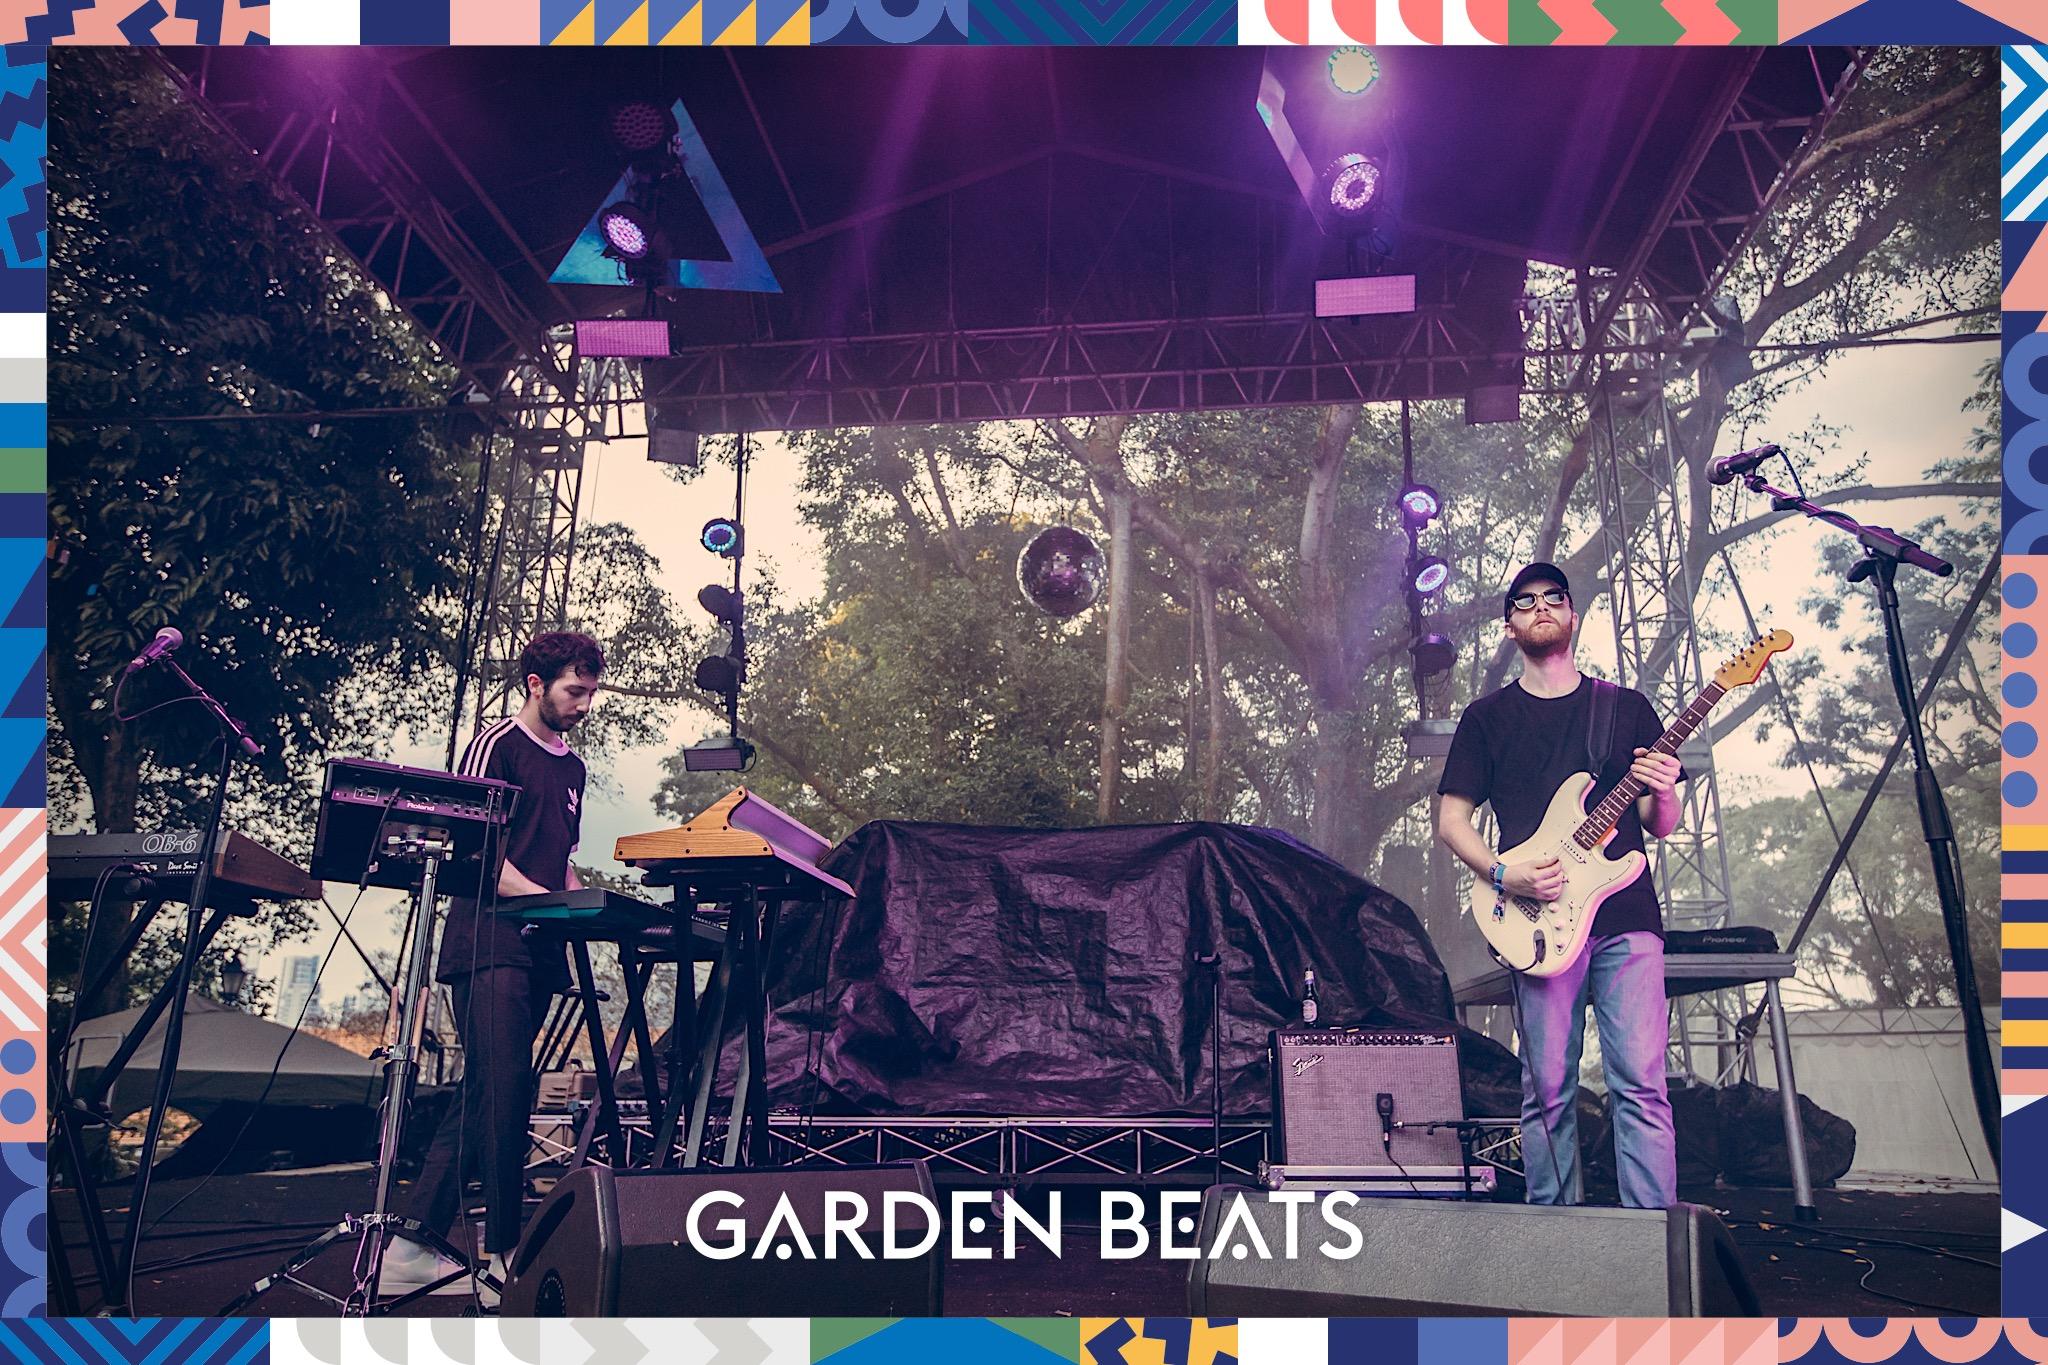 03032018_GardenBeats_Colossal584_Watermarked.jpg